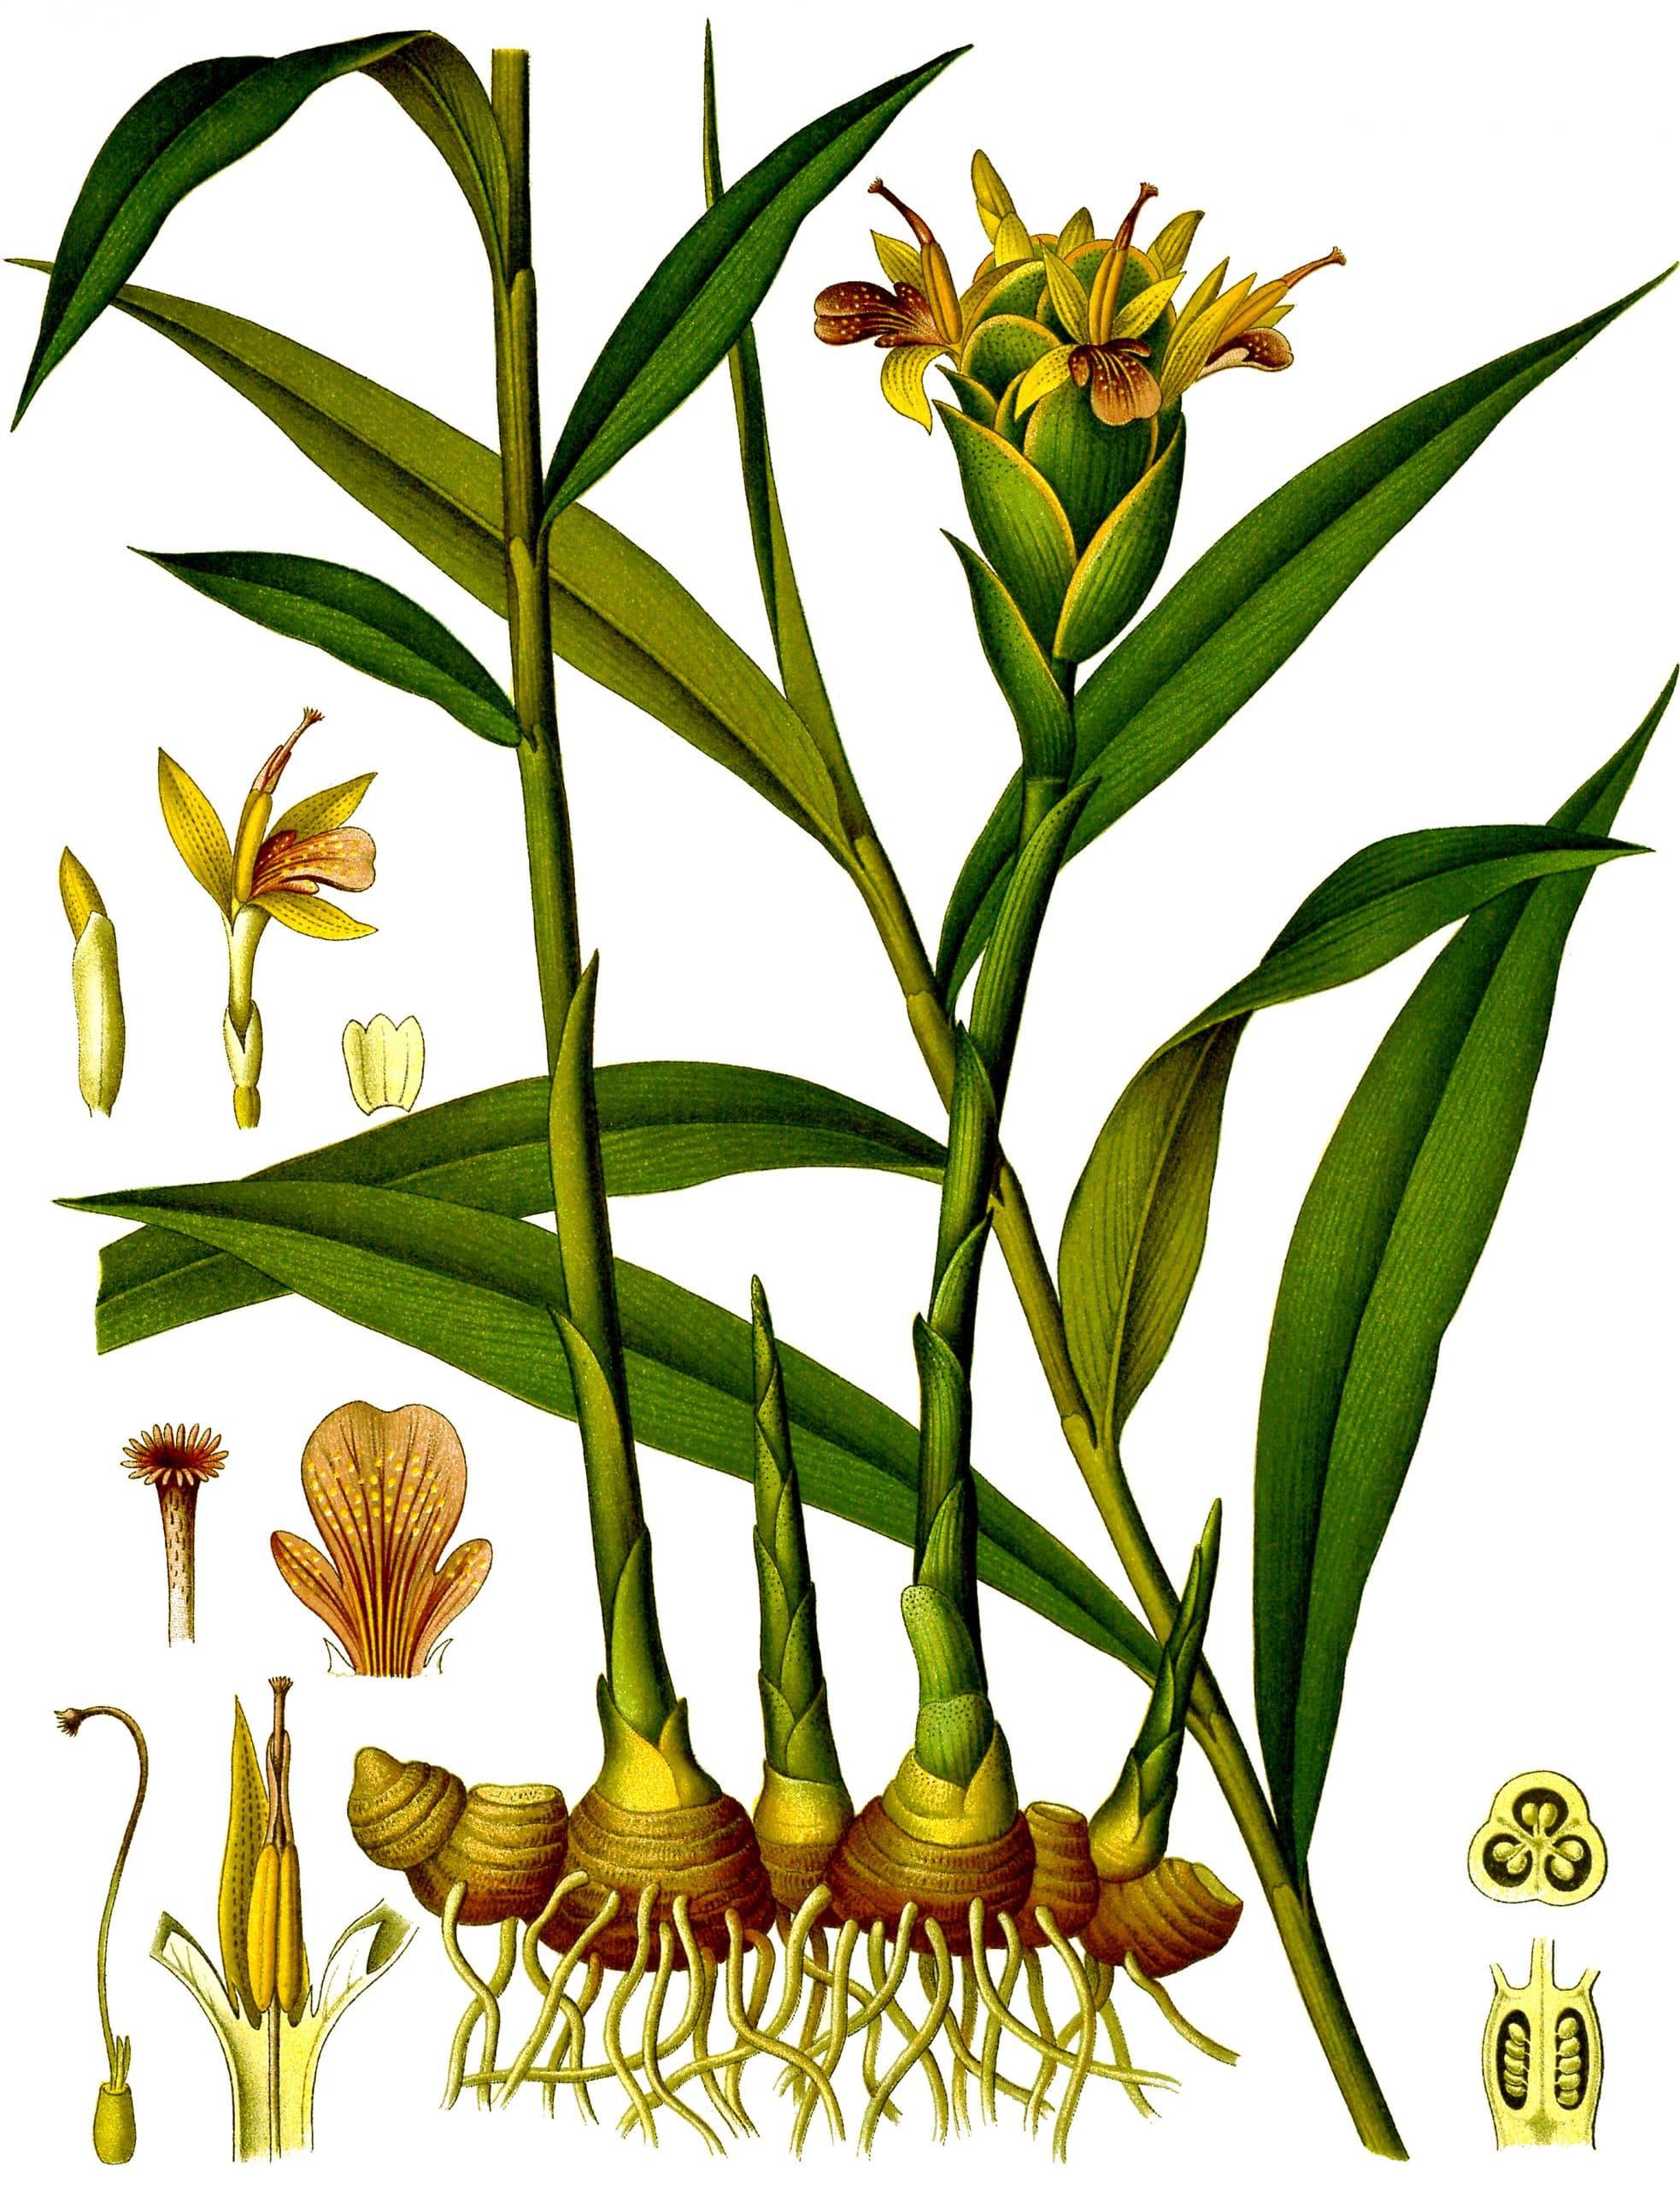 Gemberplant (Zingiber officinale)